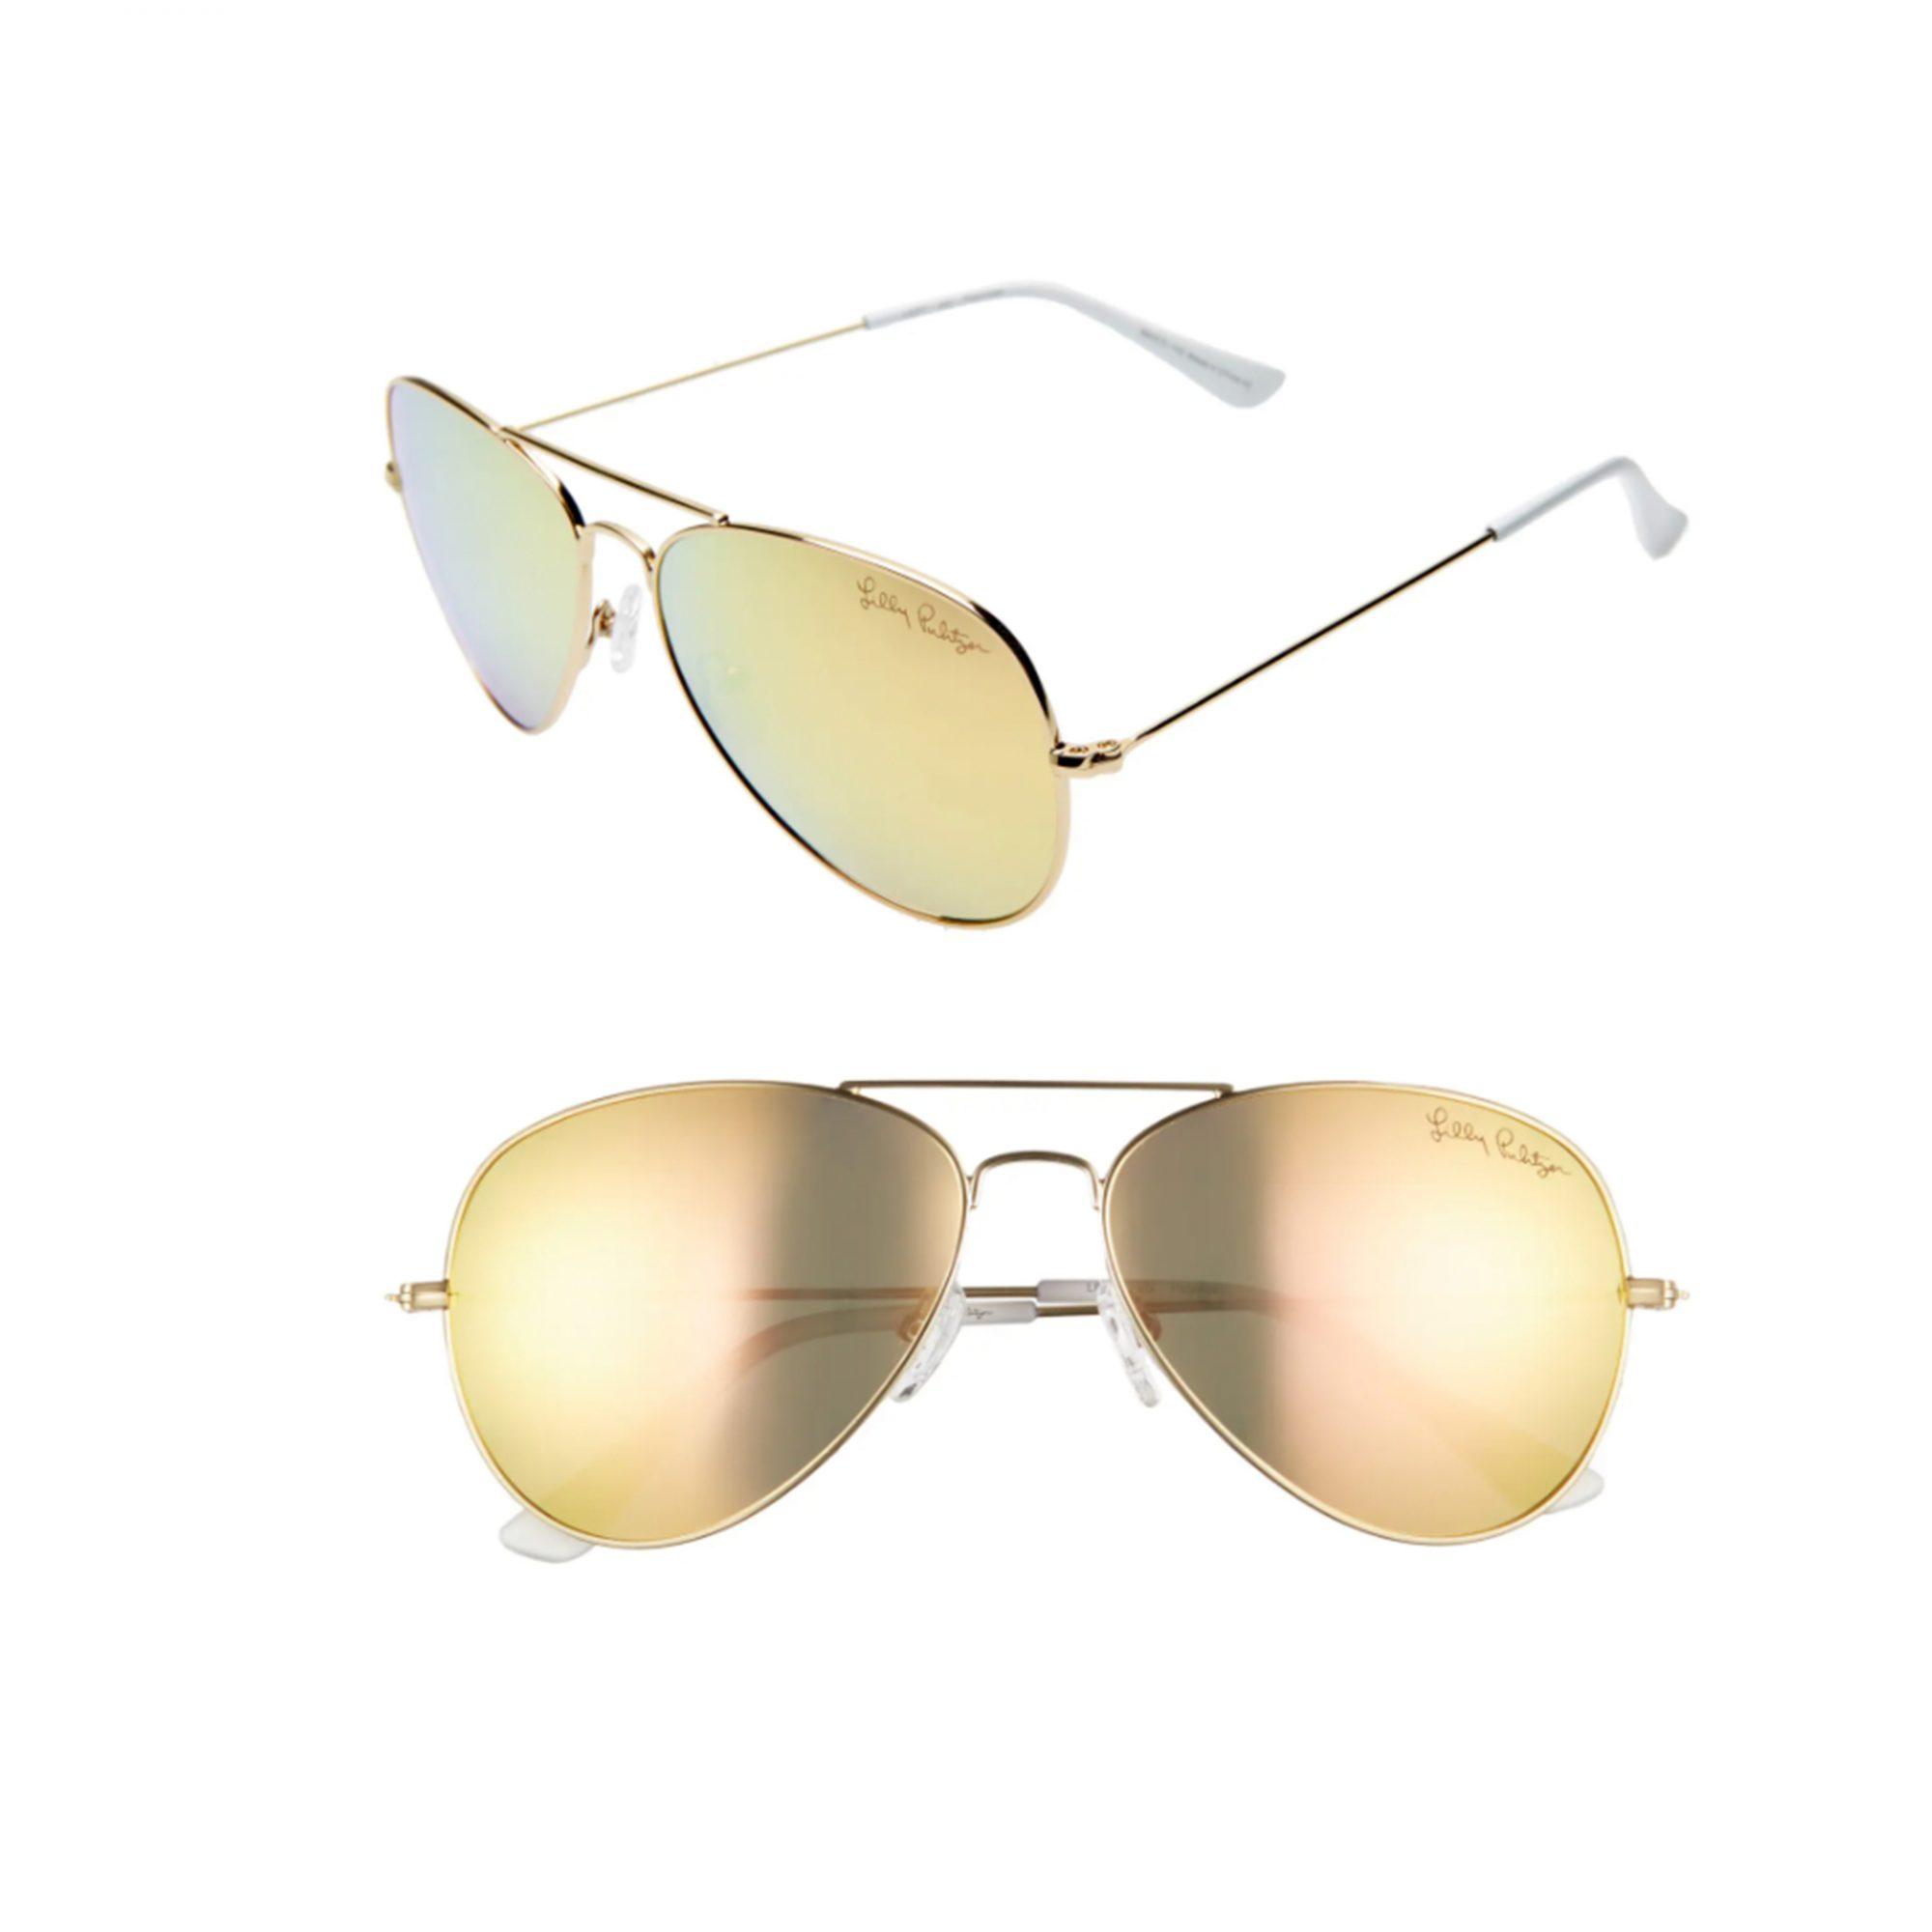 lilly-pulitzer-mirrored-sunglasses